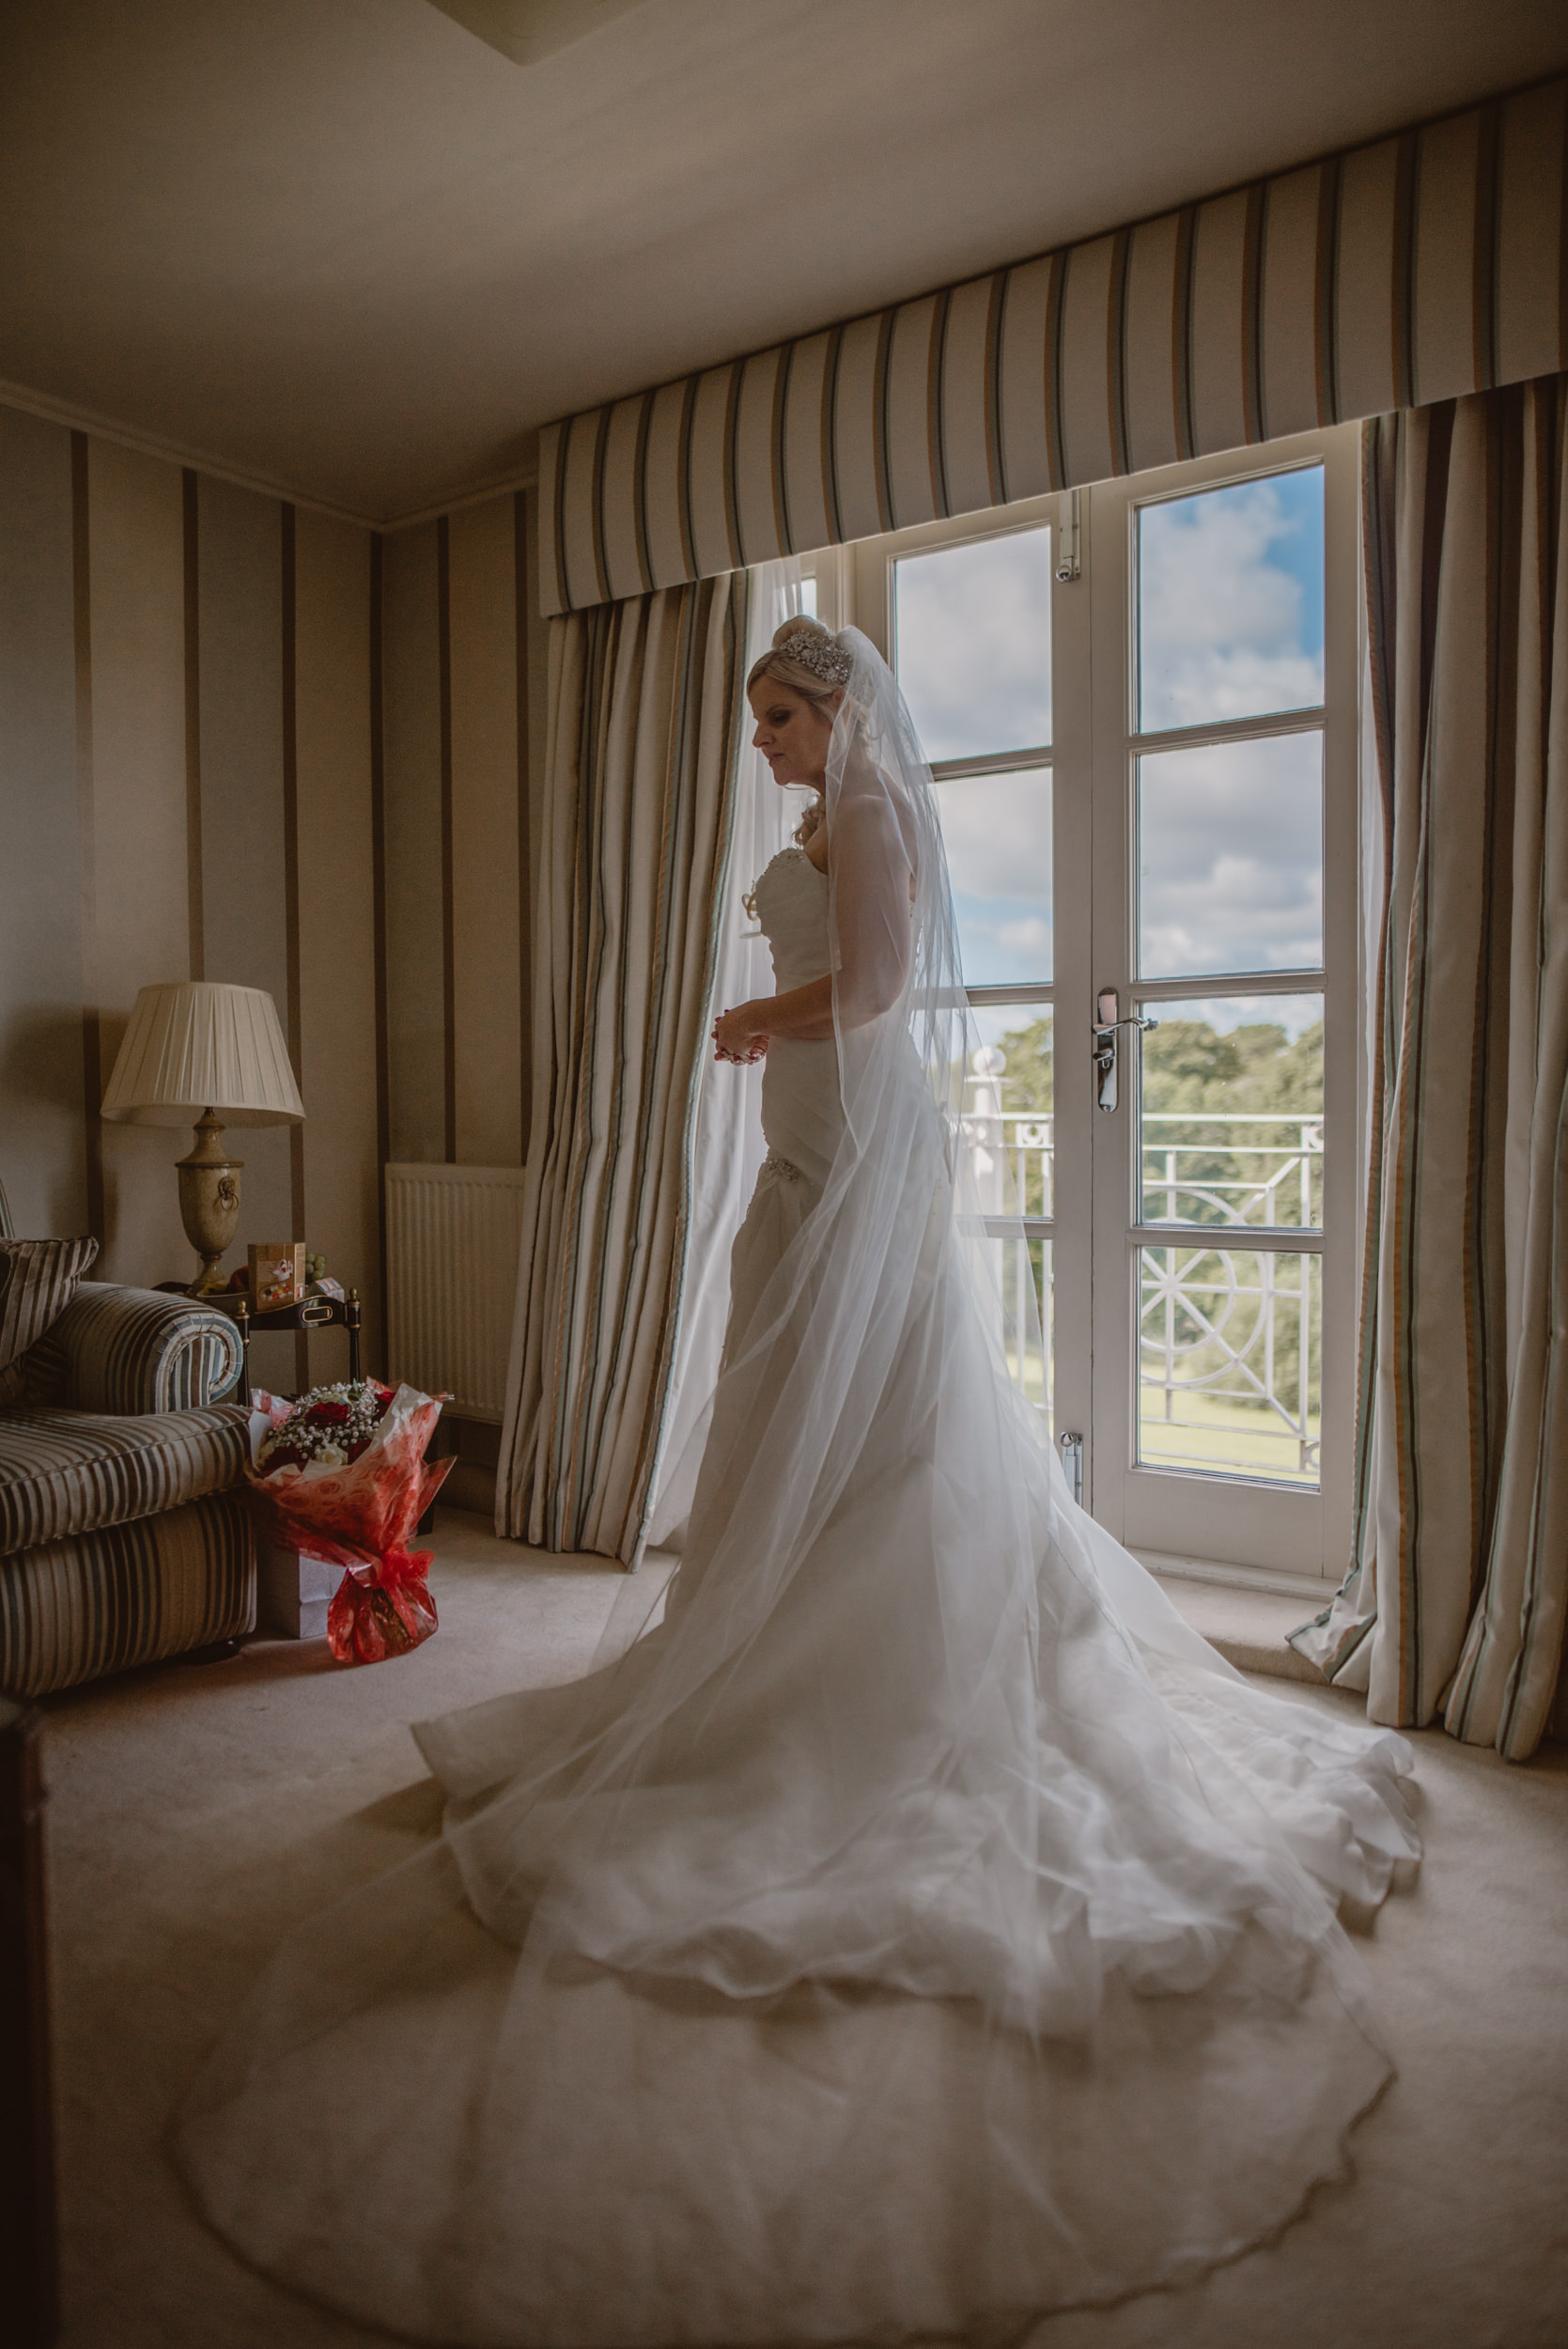 Trisha-and-Roger-wedding-The-Priory-Church-and-Chewton-Glen-Hotel-Christchurch-Manu-Mendoza-Wedding-Photography-076.jpg